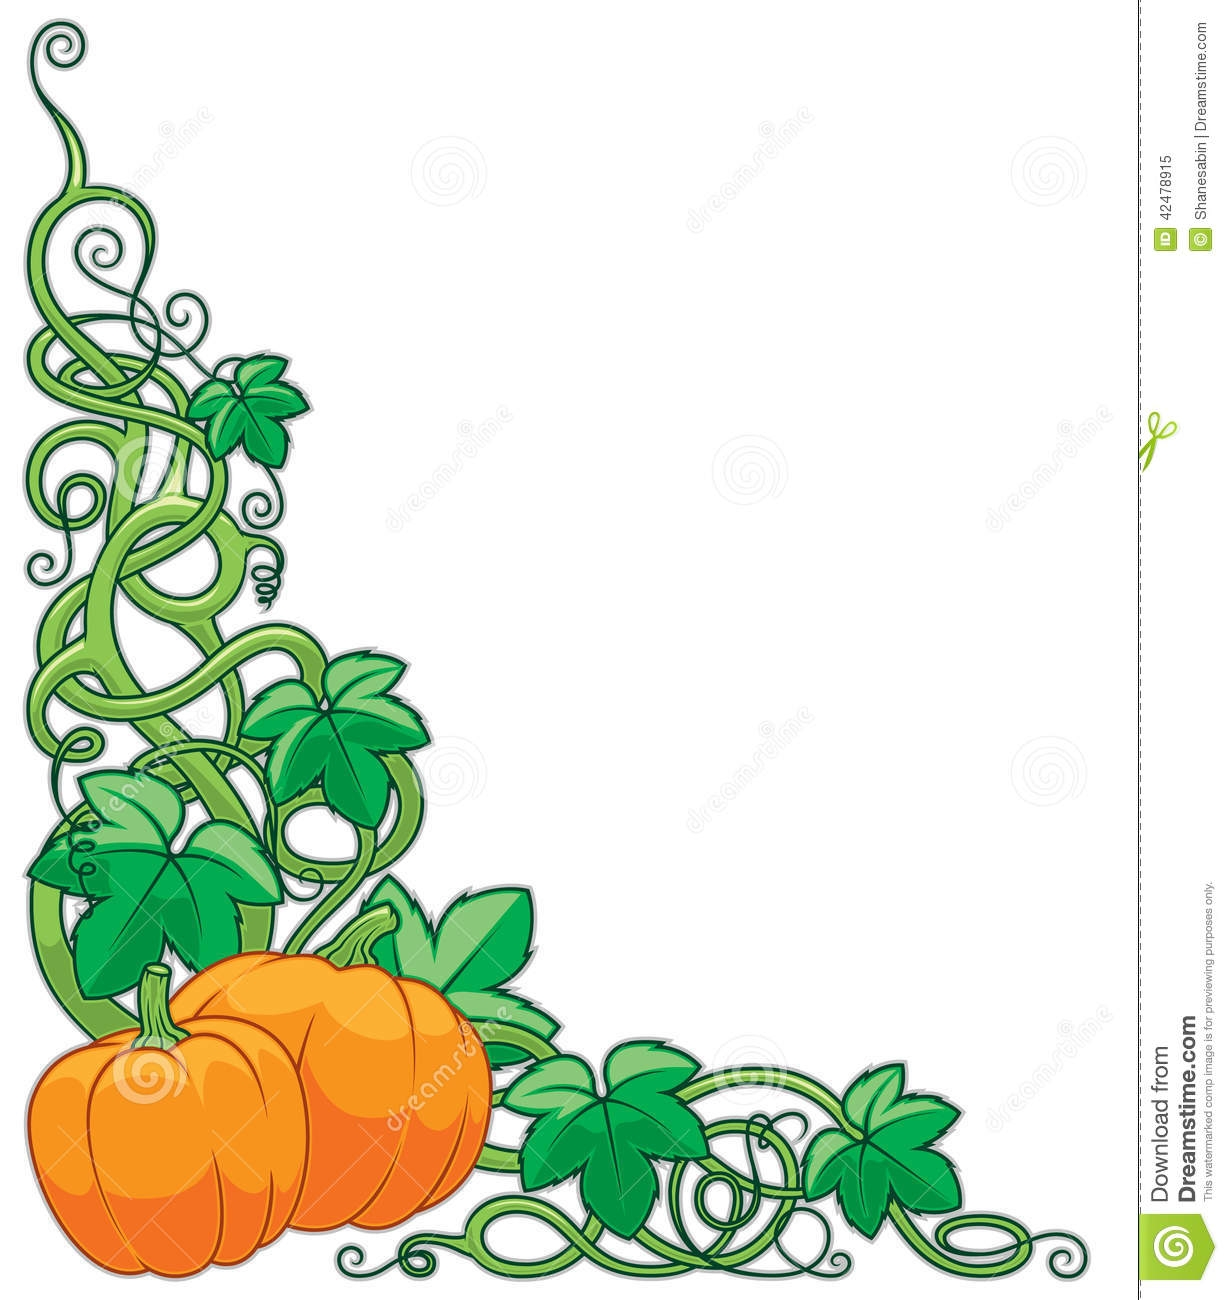 1228x1300 Pumpkin Vine Border Clipart